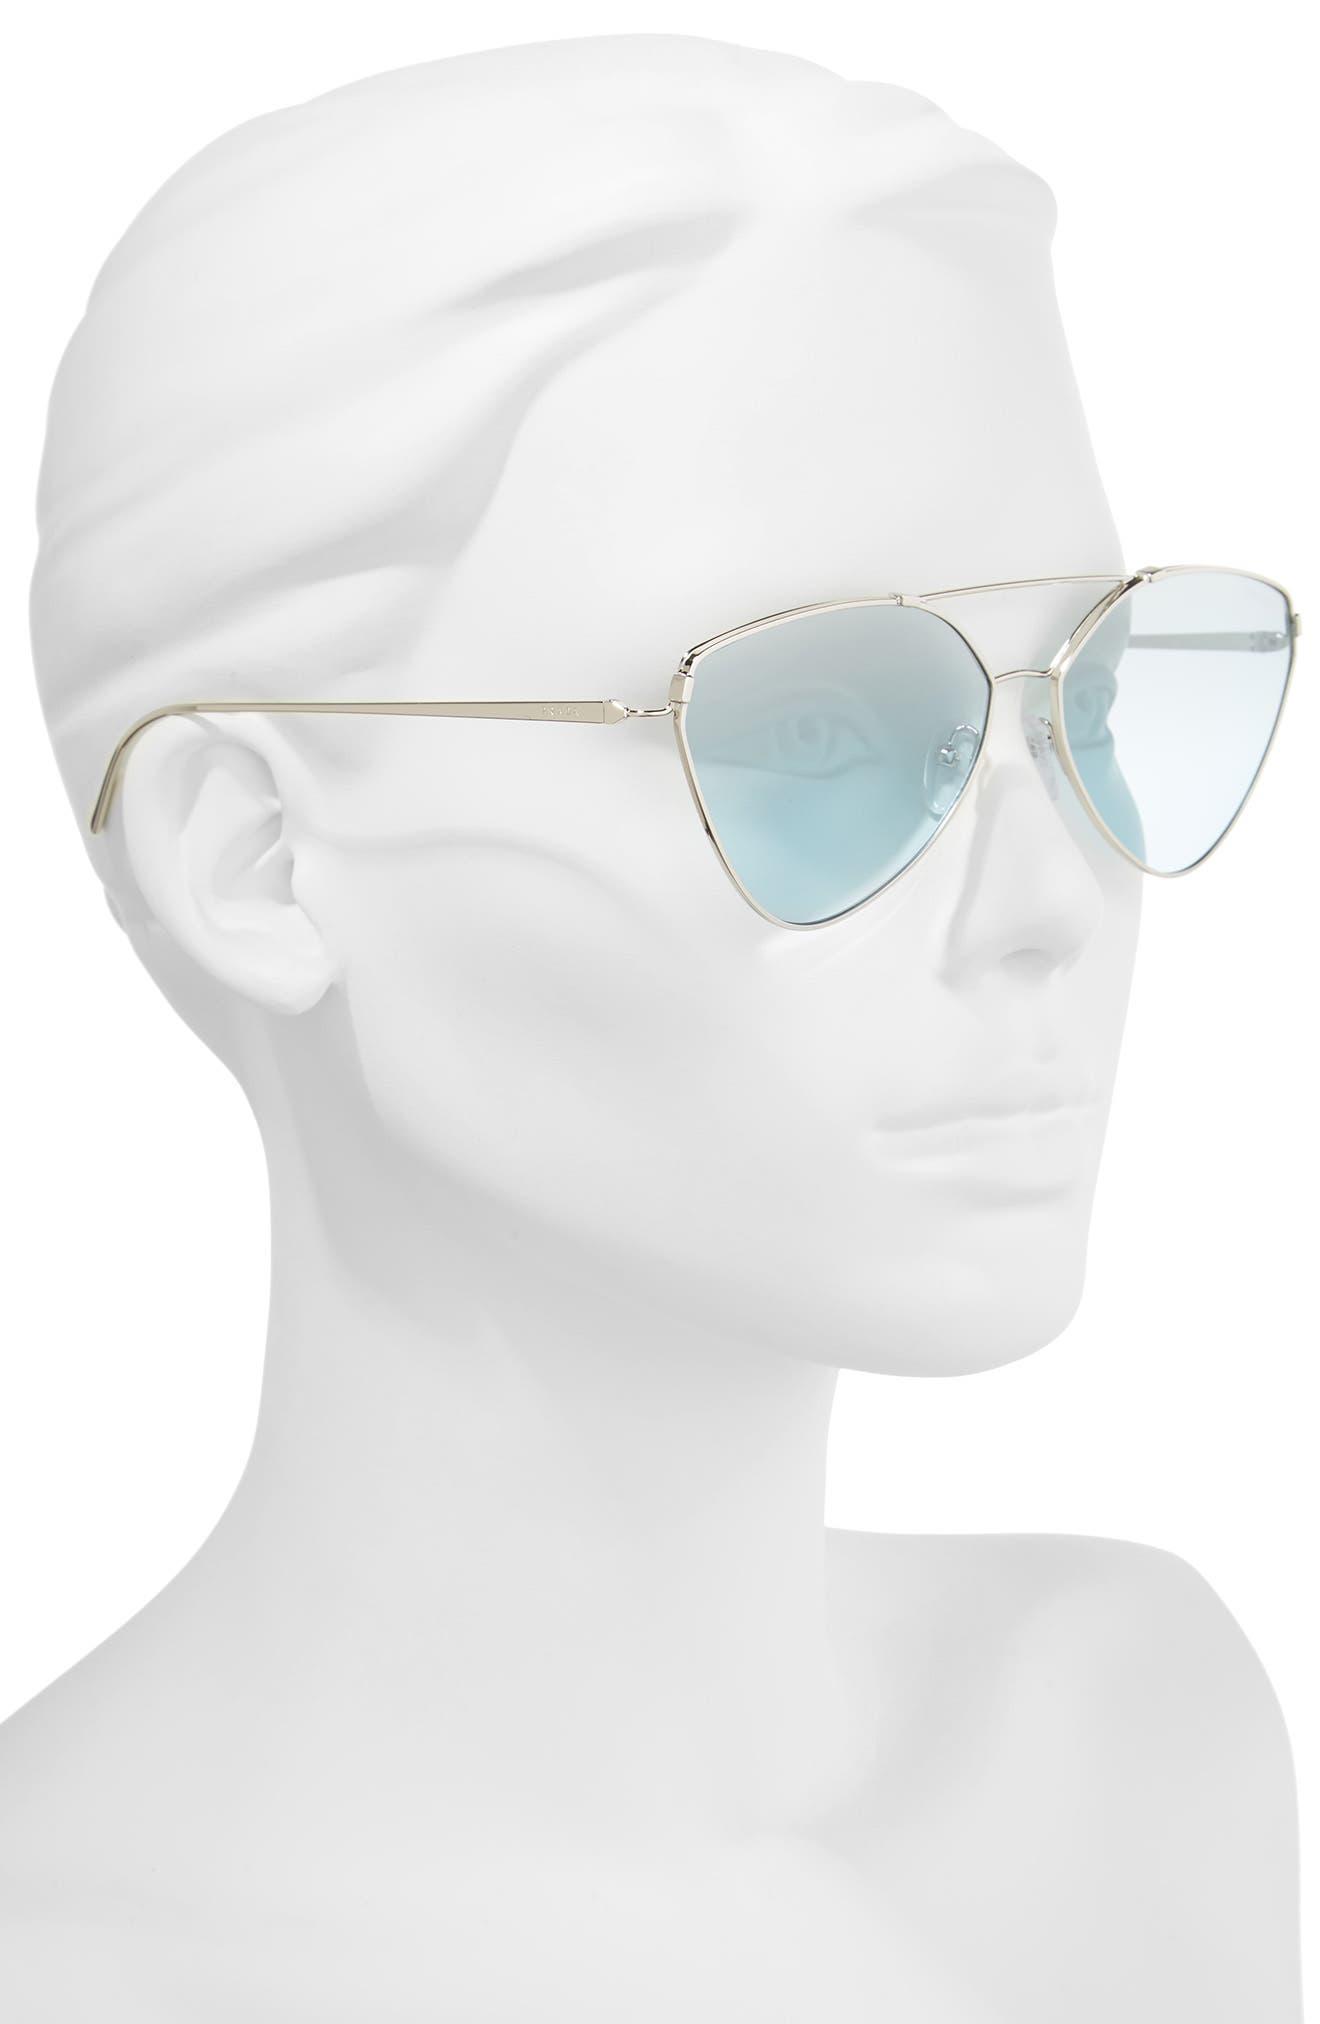 62mm Oversize Aviator Sunglasses,                             Alternate thumbnail 3, color,